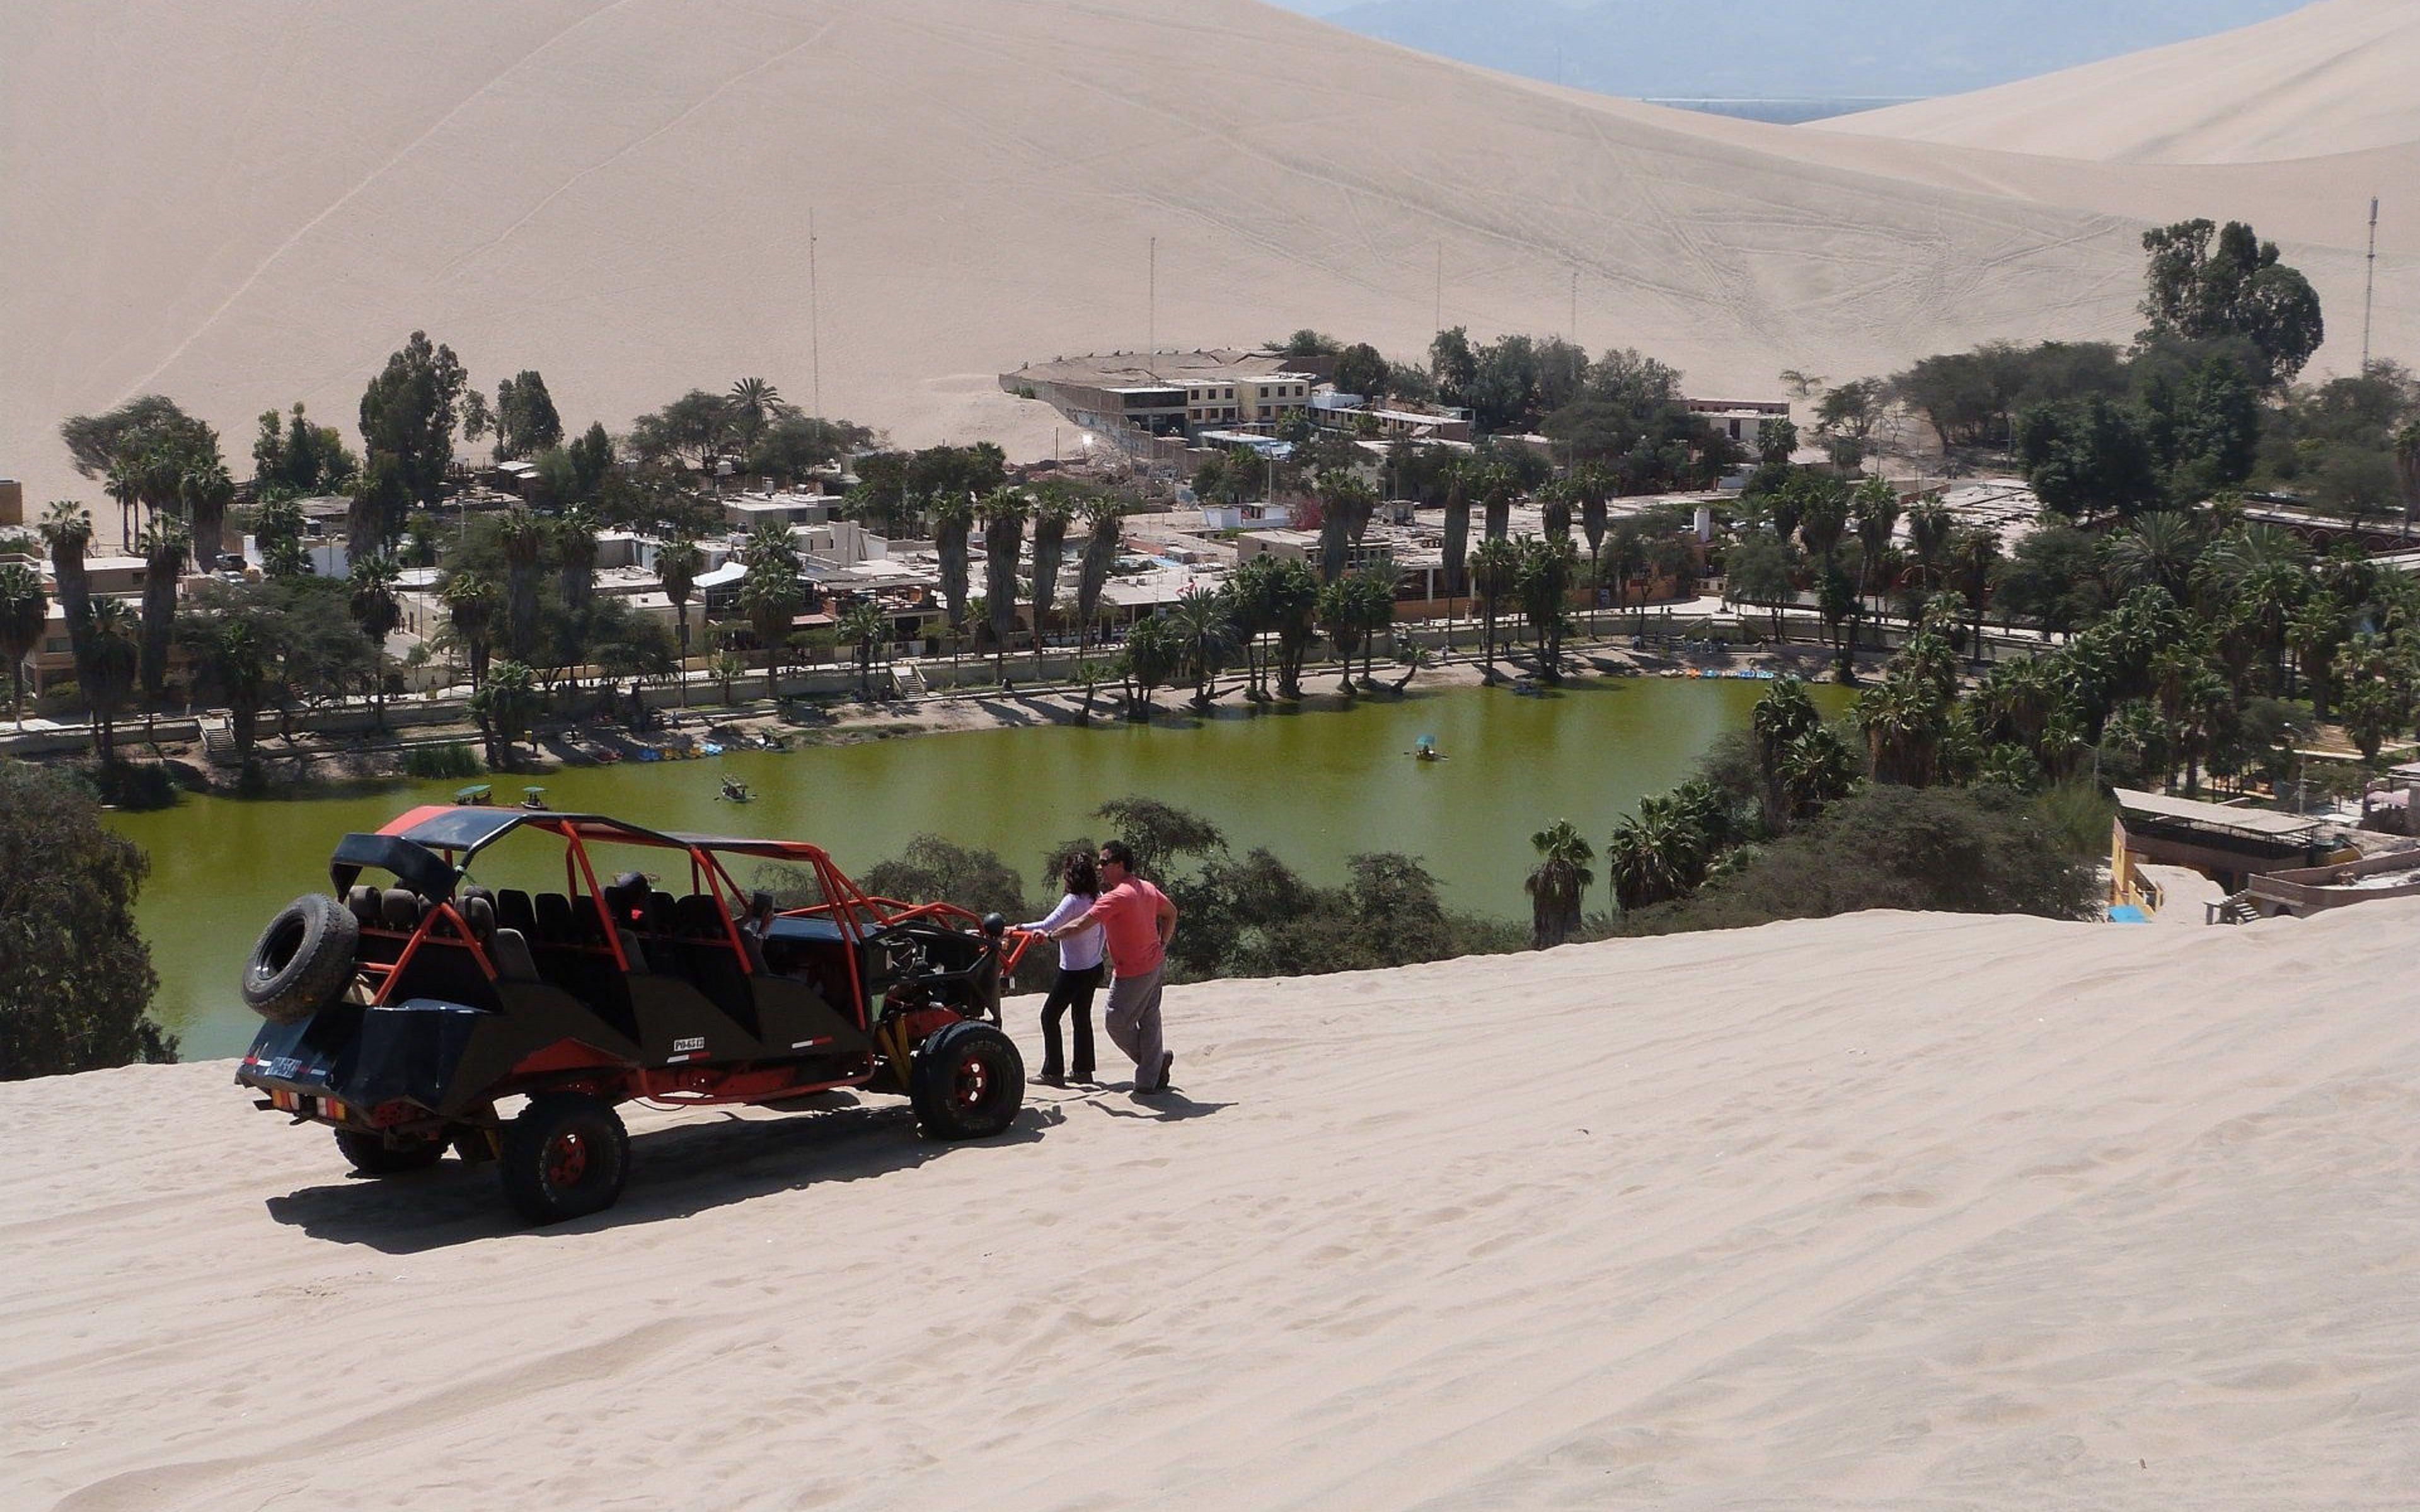 FEATURED ICA - Ica & Huacachina